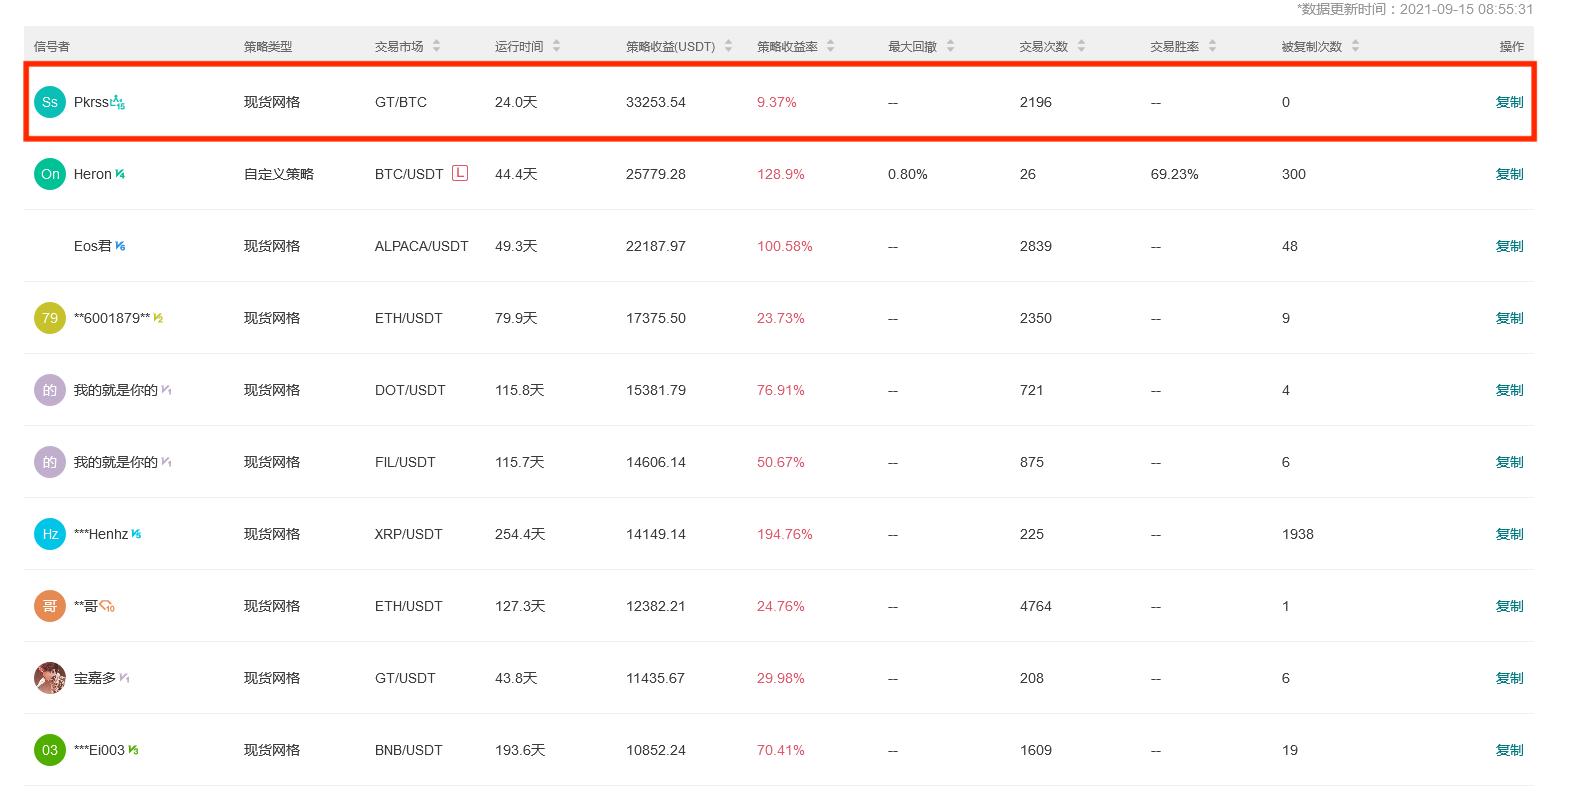 Gate.io 今日智能量化收益排行,最高总收益80401.52 USDT